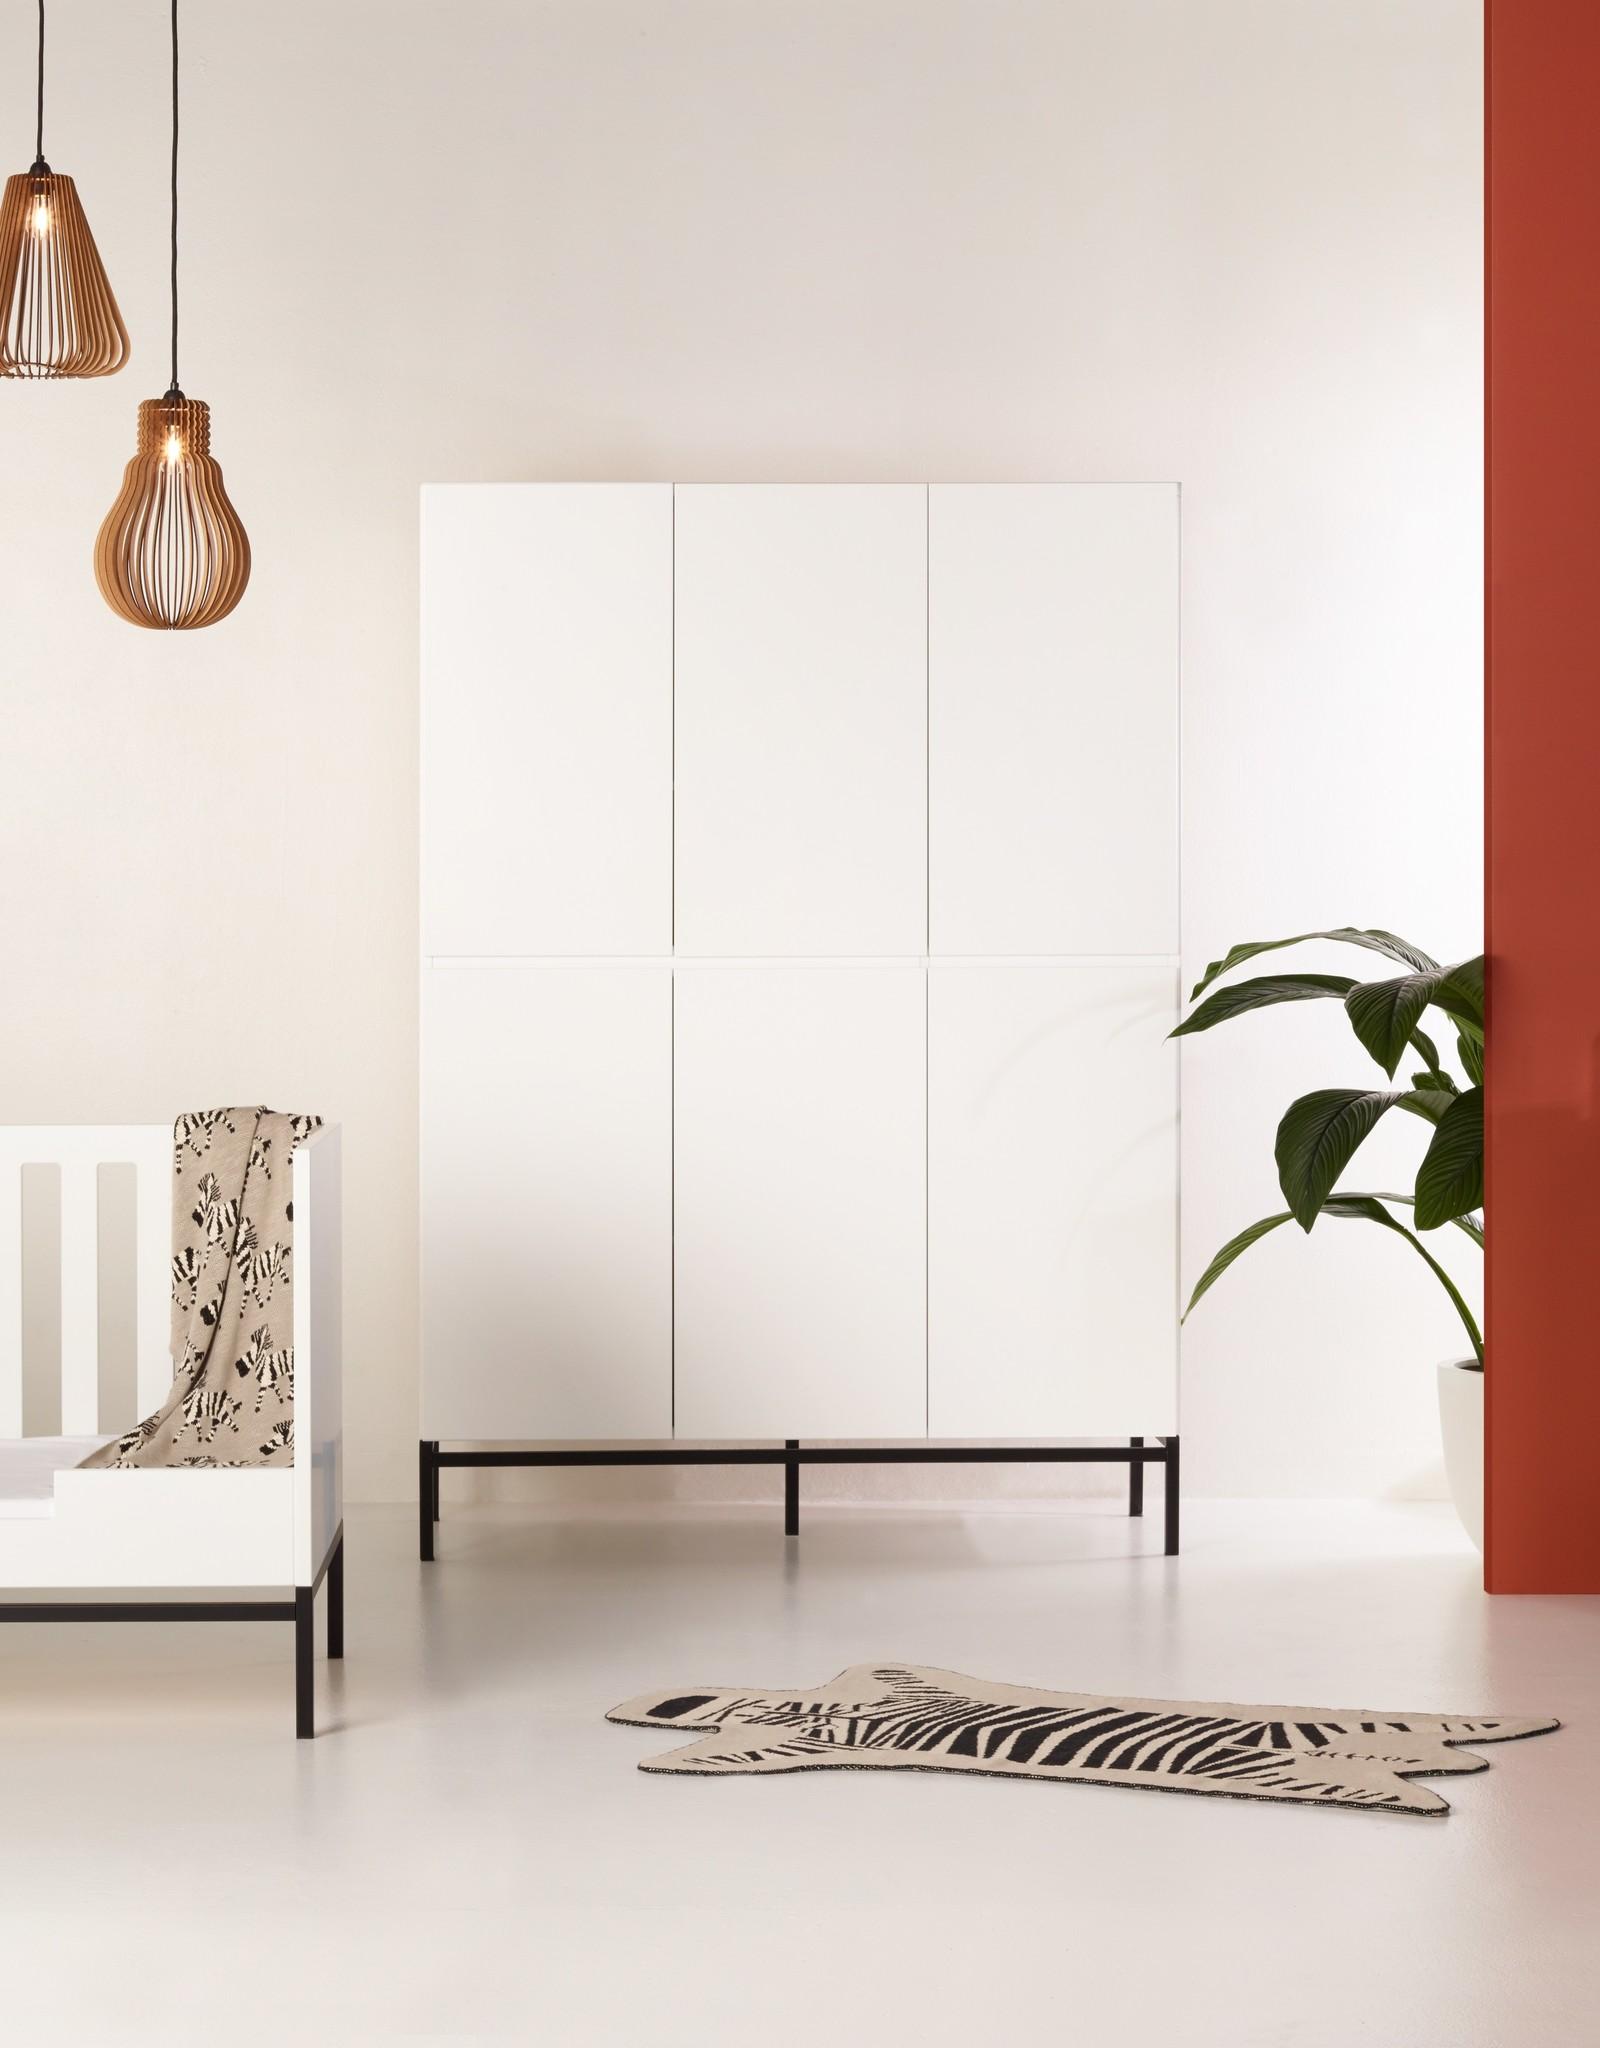 Quax Havana - Bed/sofa 140 x 70 Cm - Wit